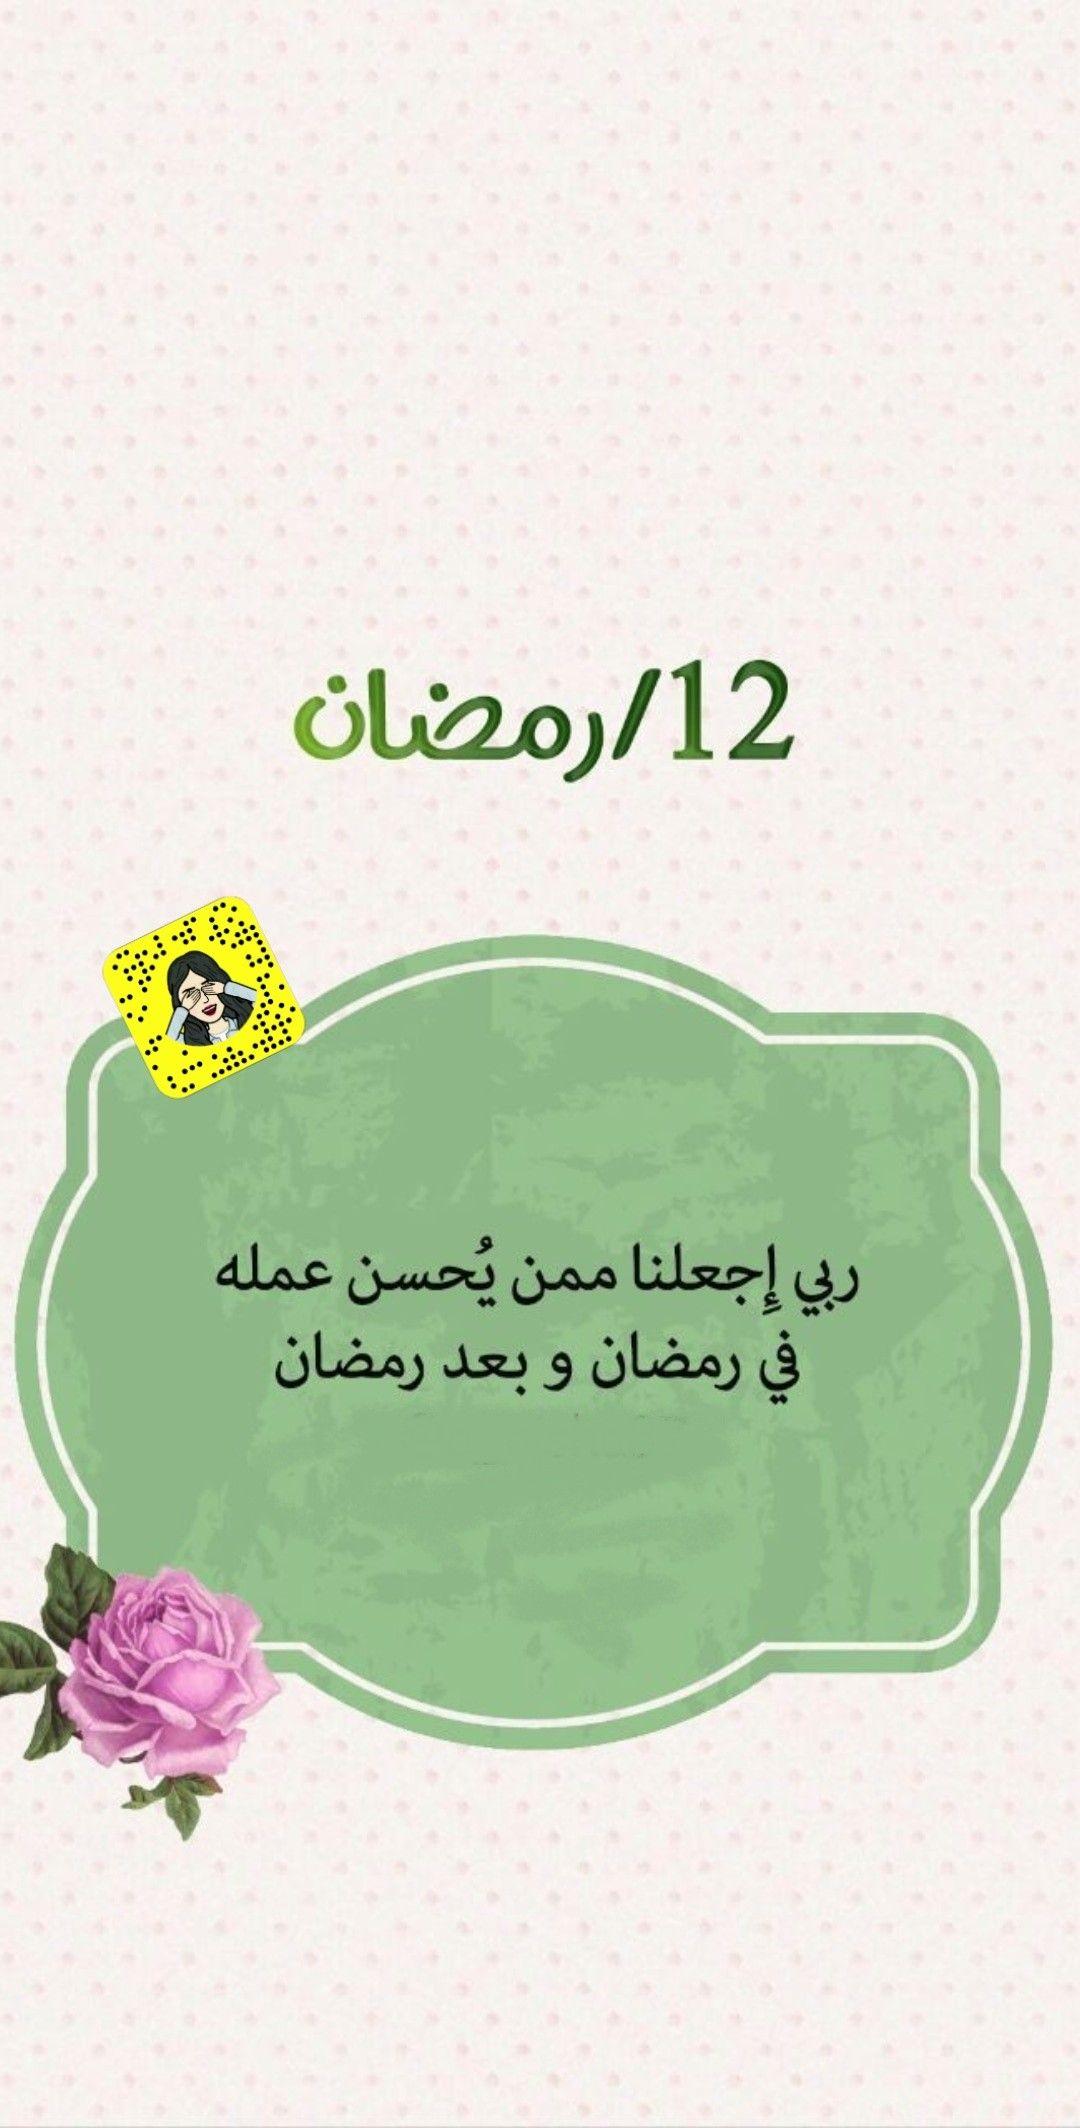 Pin By Zino On علاج لكل شيء In 2020 Ramadan Day Ramadan Mubarak Wallpapers Islamic Quotes Quran